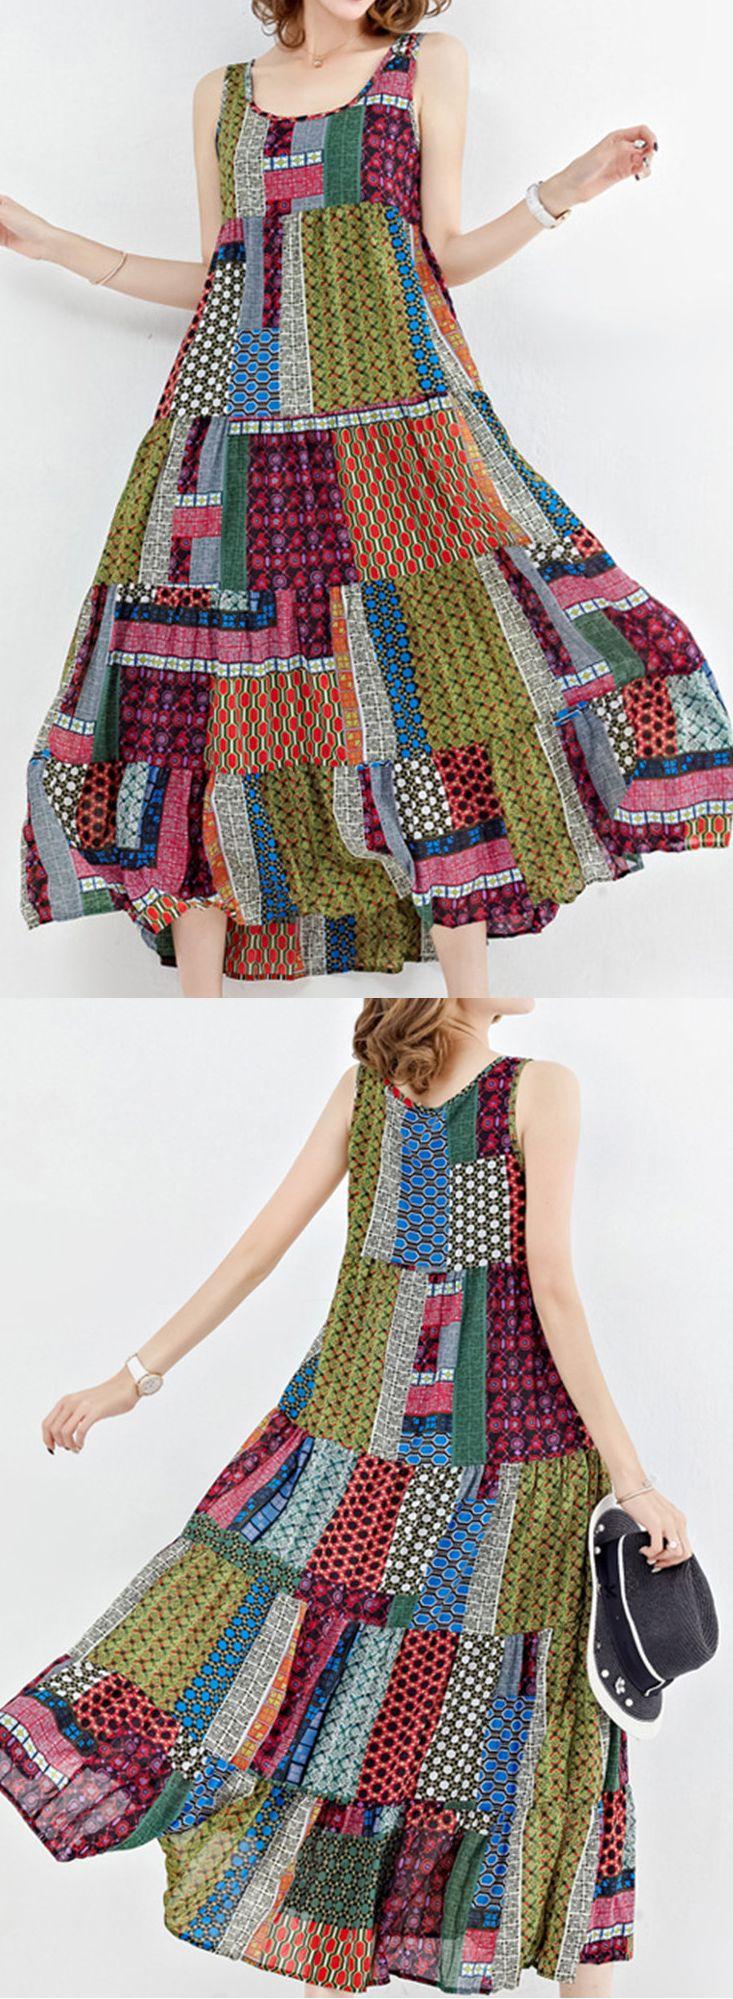 US$ 25.20 Gracila Bohemian Patchwork Sleeveless O-Neck Long Maxi Dresses